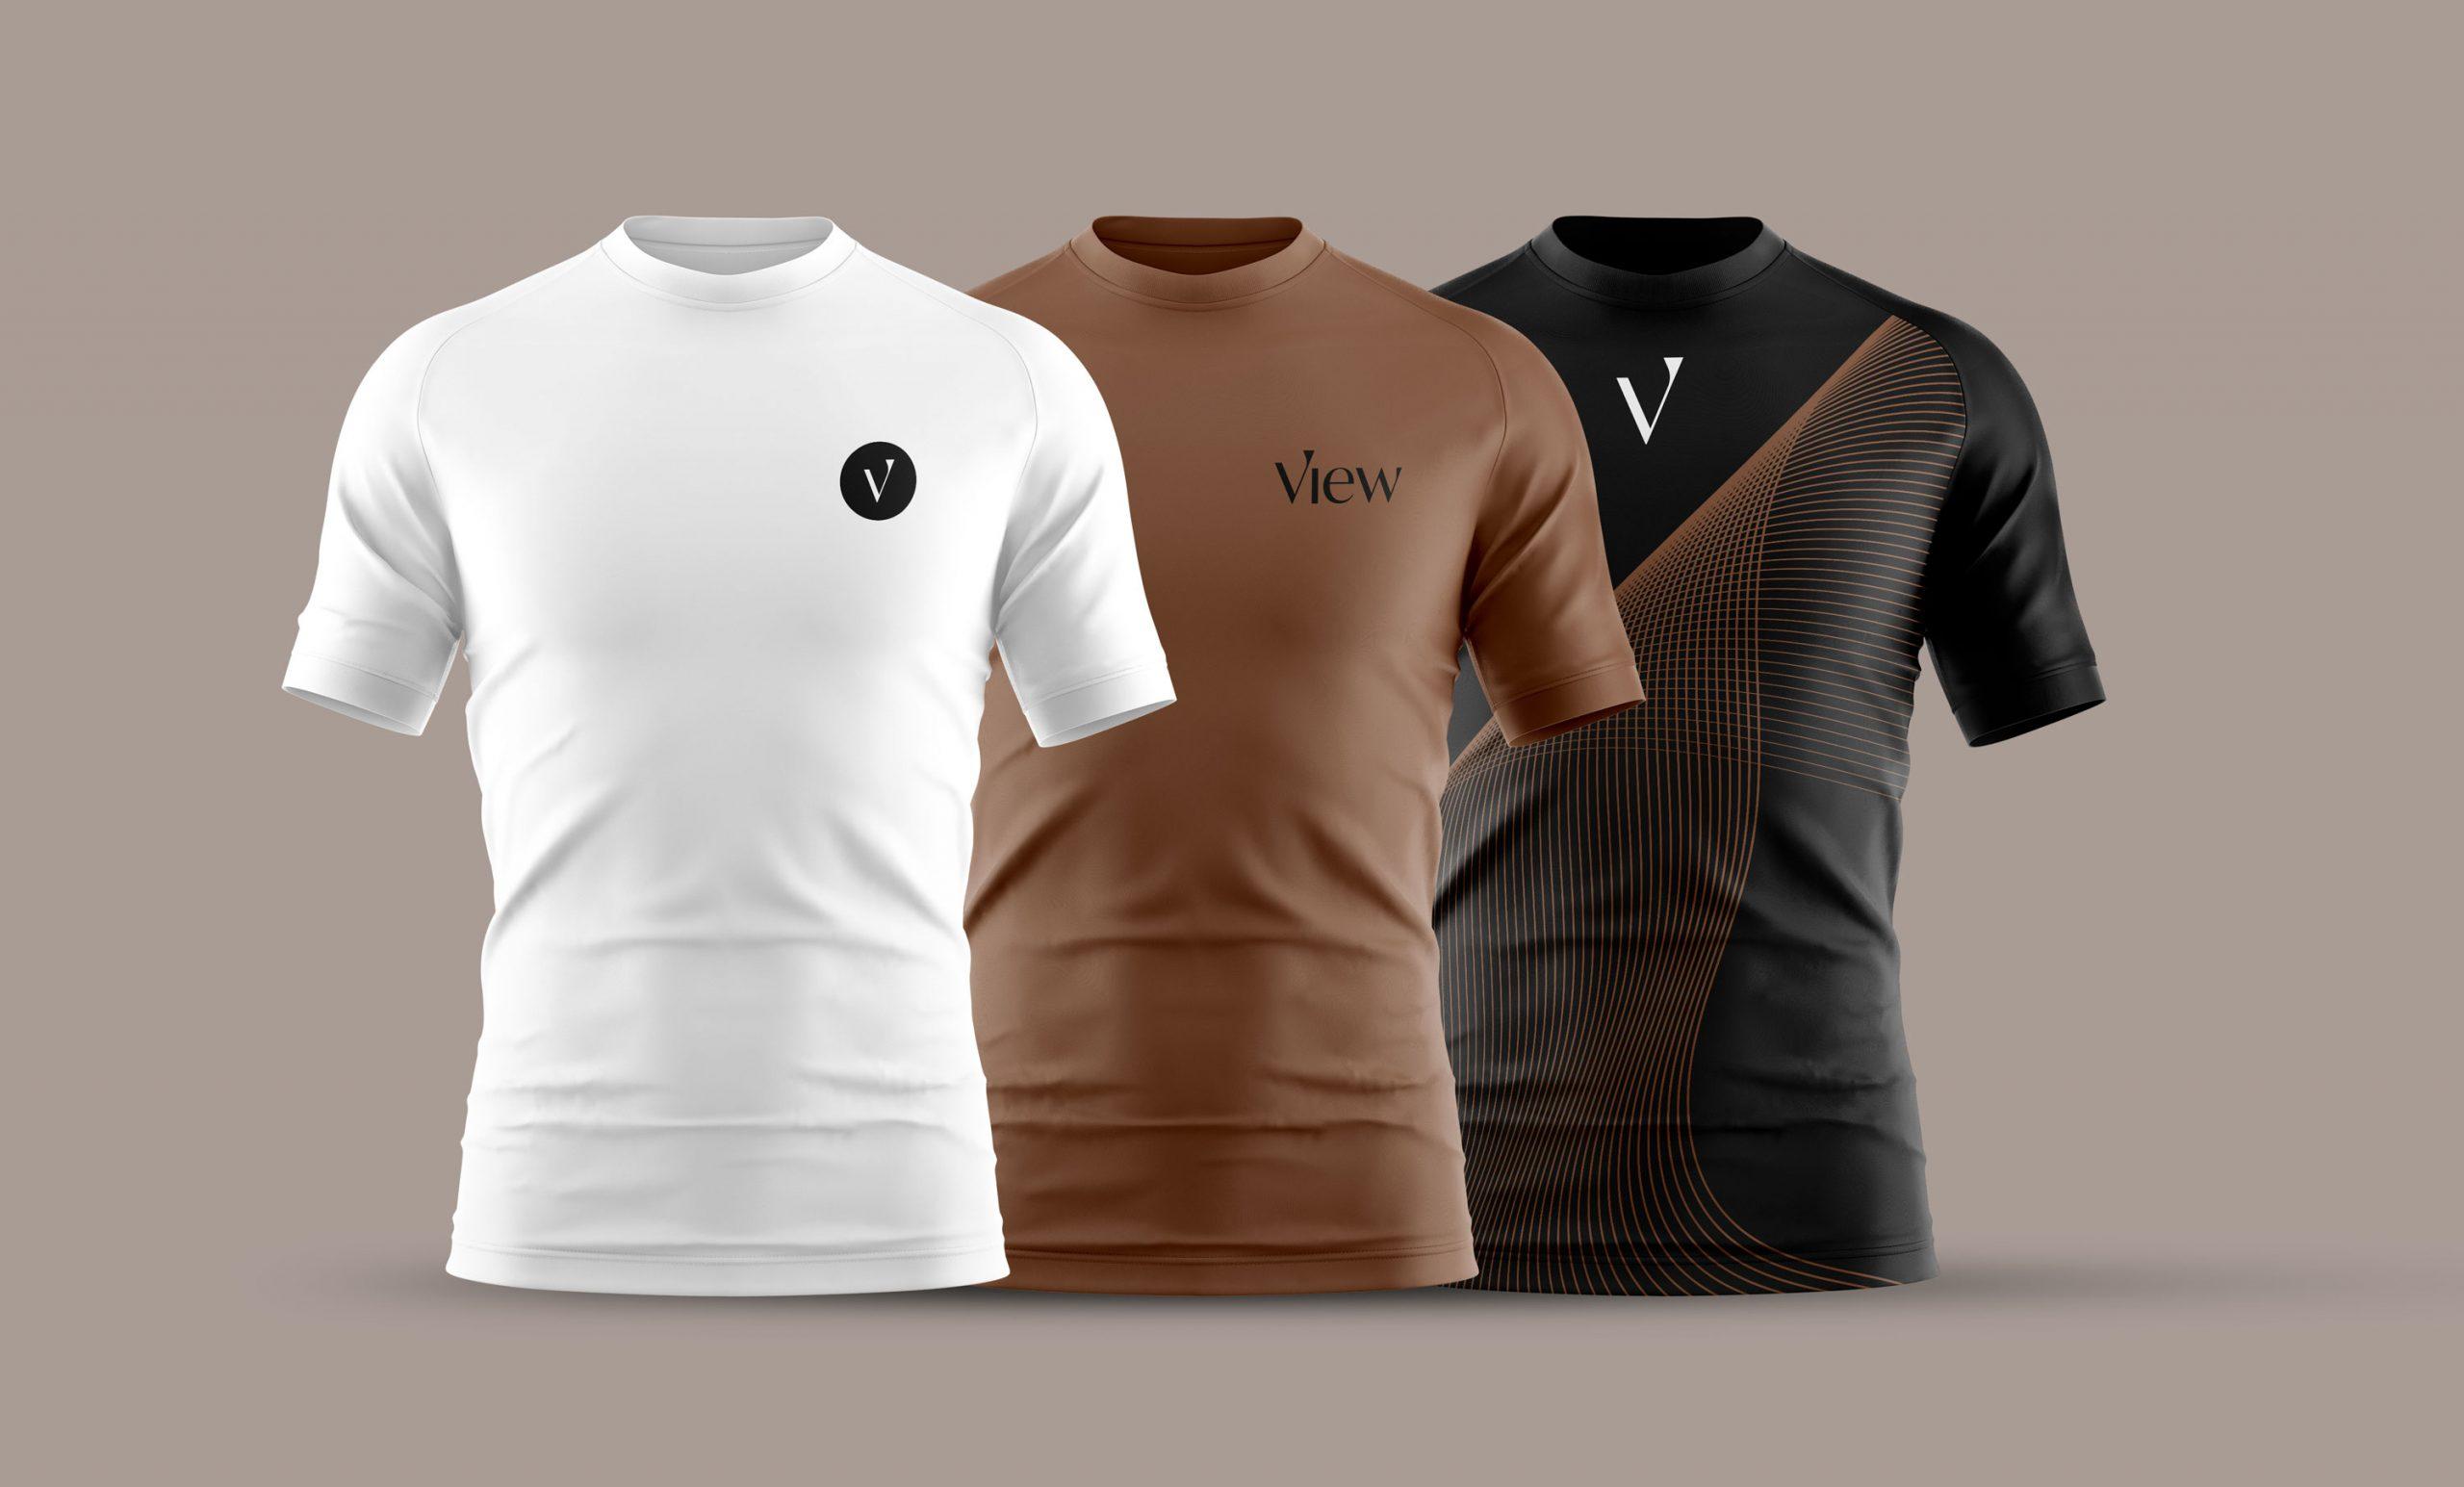 View-Tshirts-Work-by-YaStudio